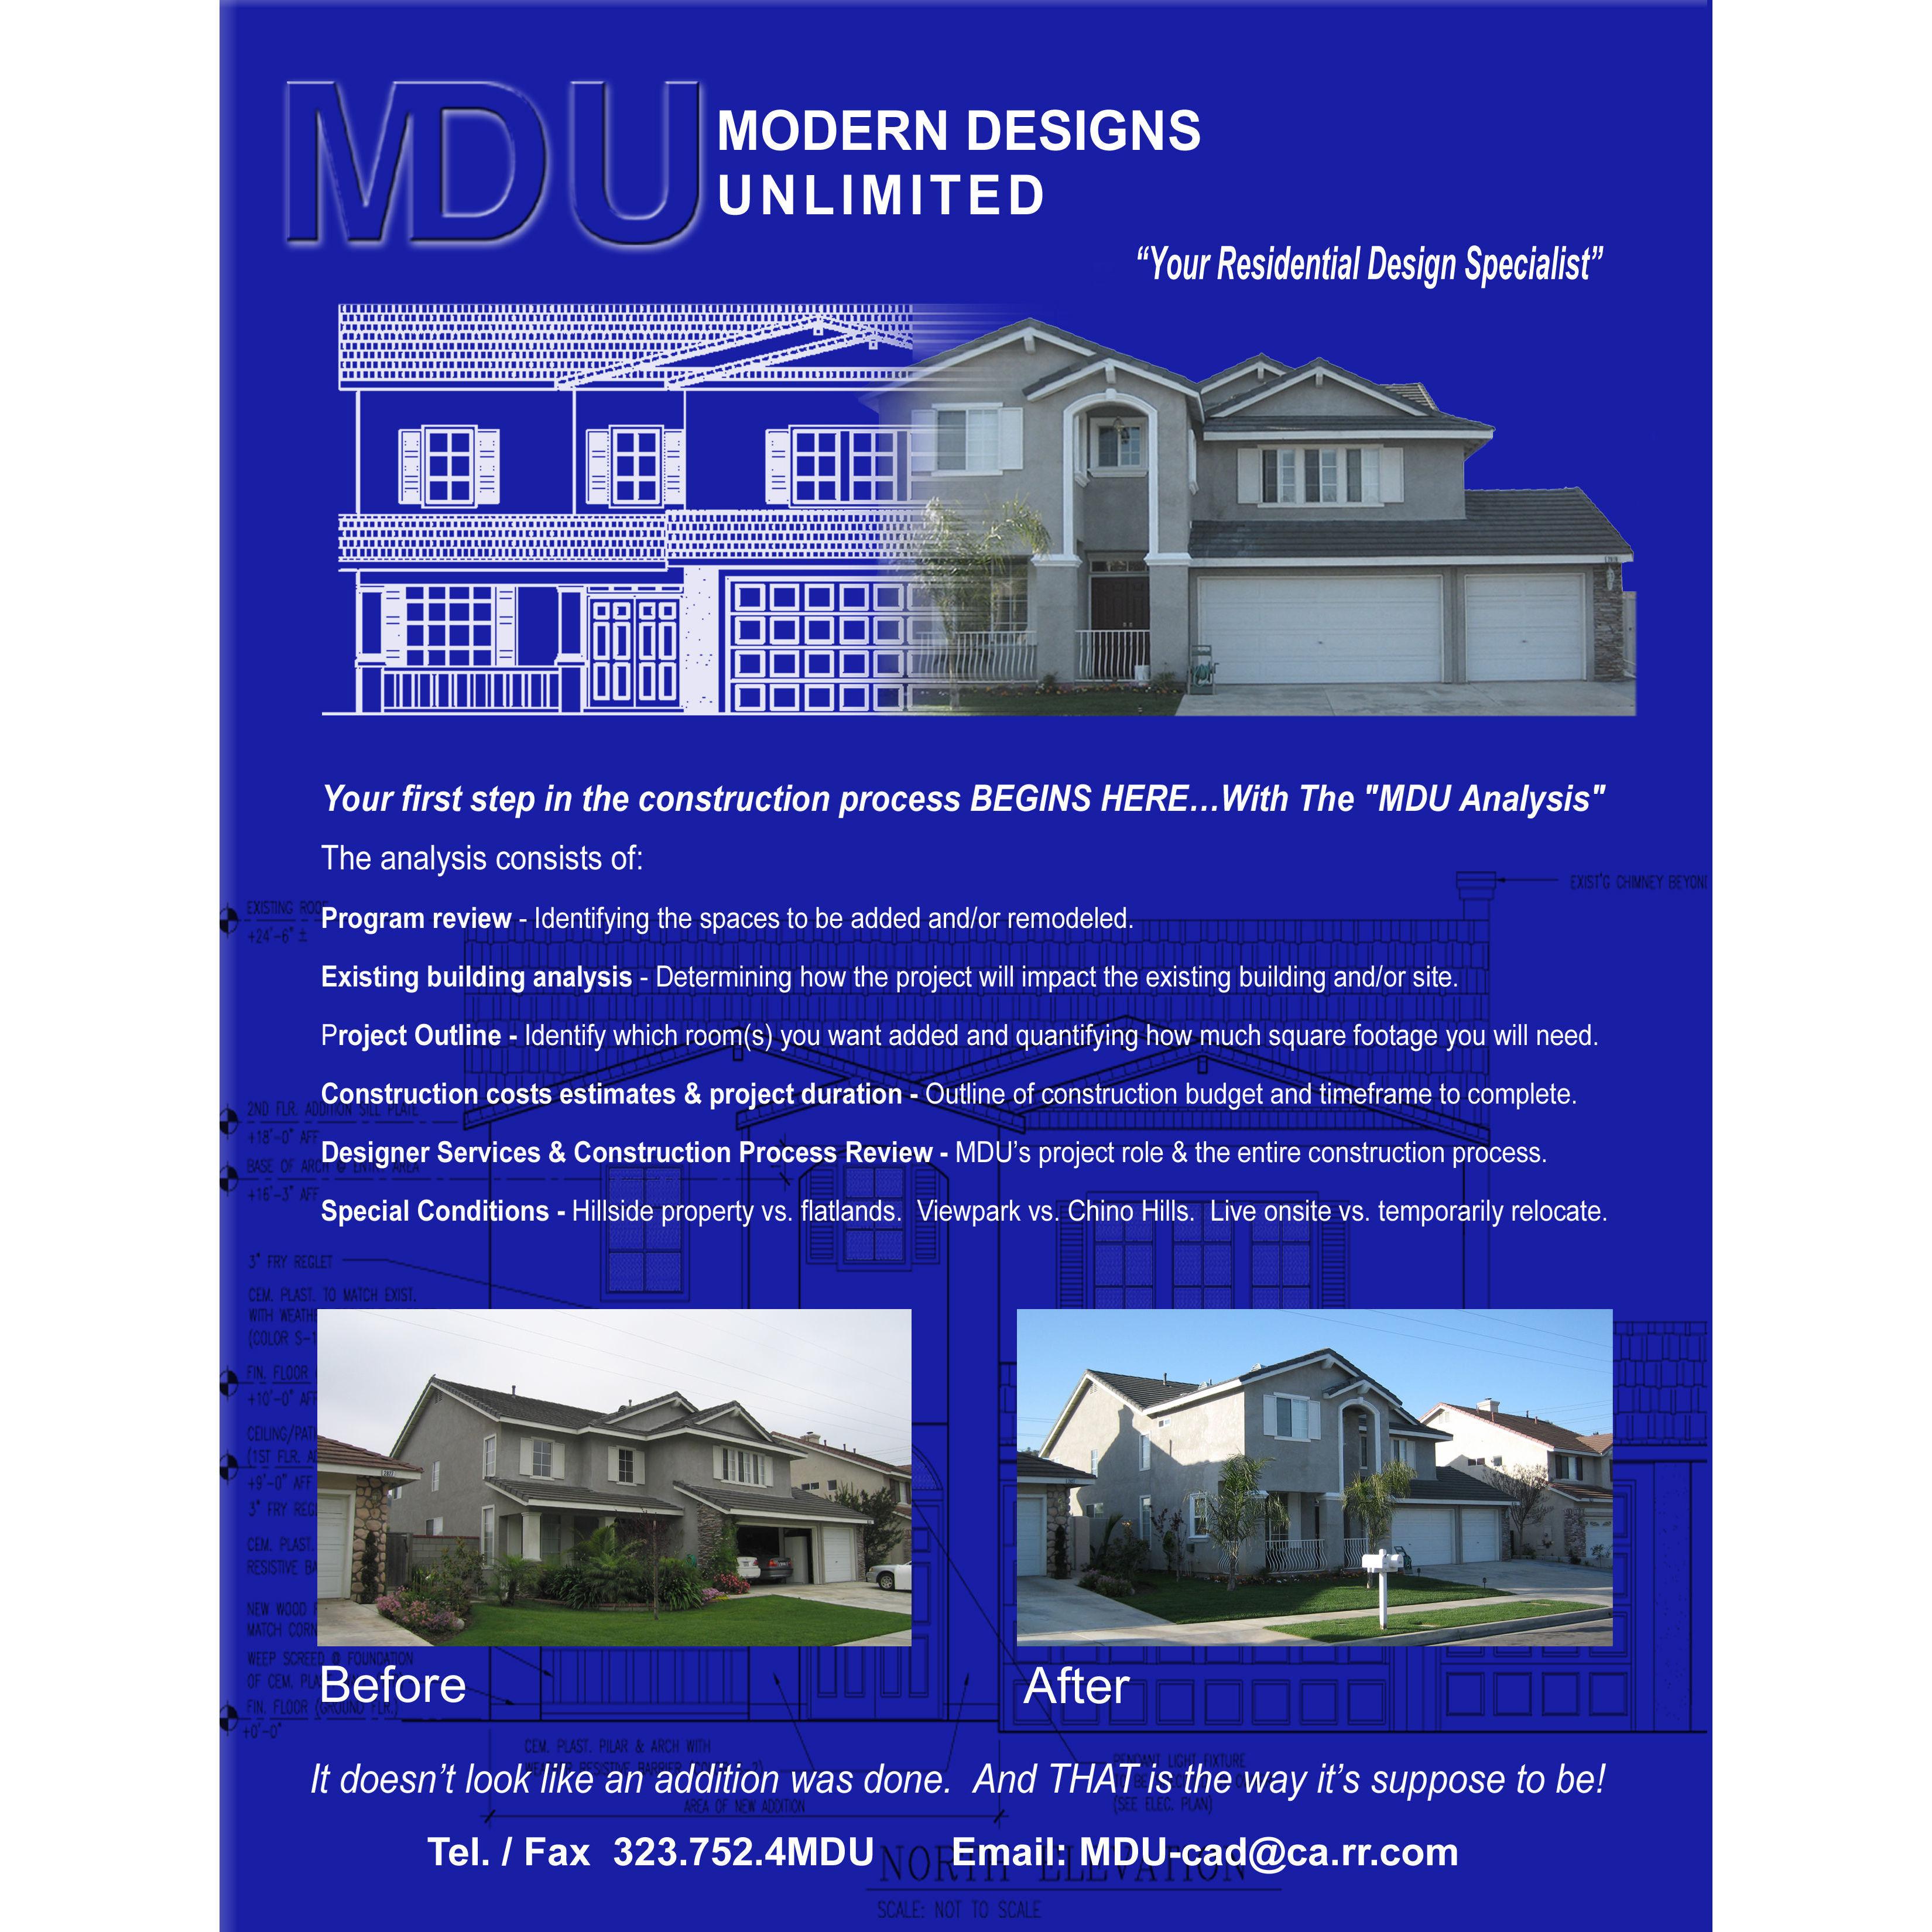 Modern Designs Unlimited image 8